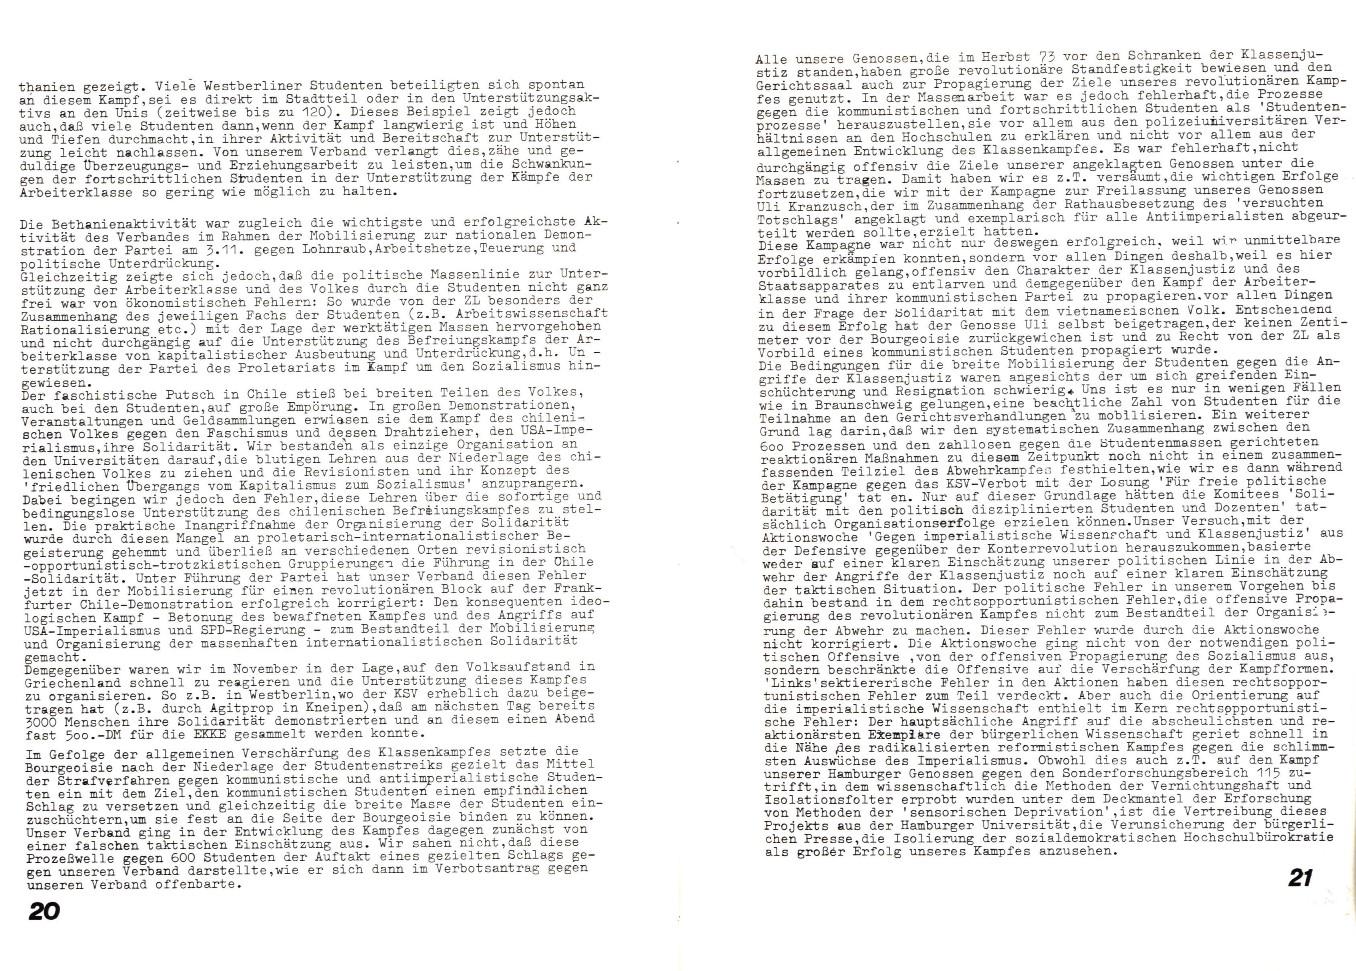 KSV_1974_Rechenschaftsbericht_12